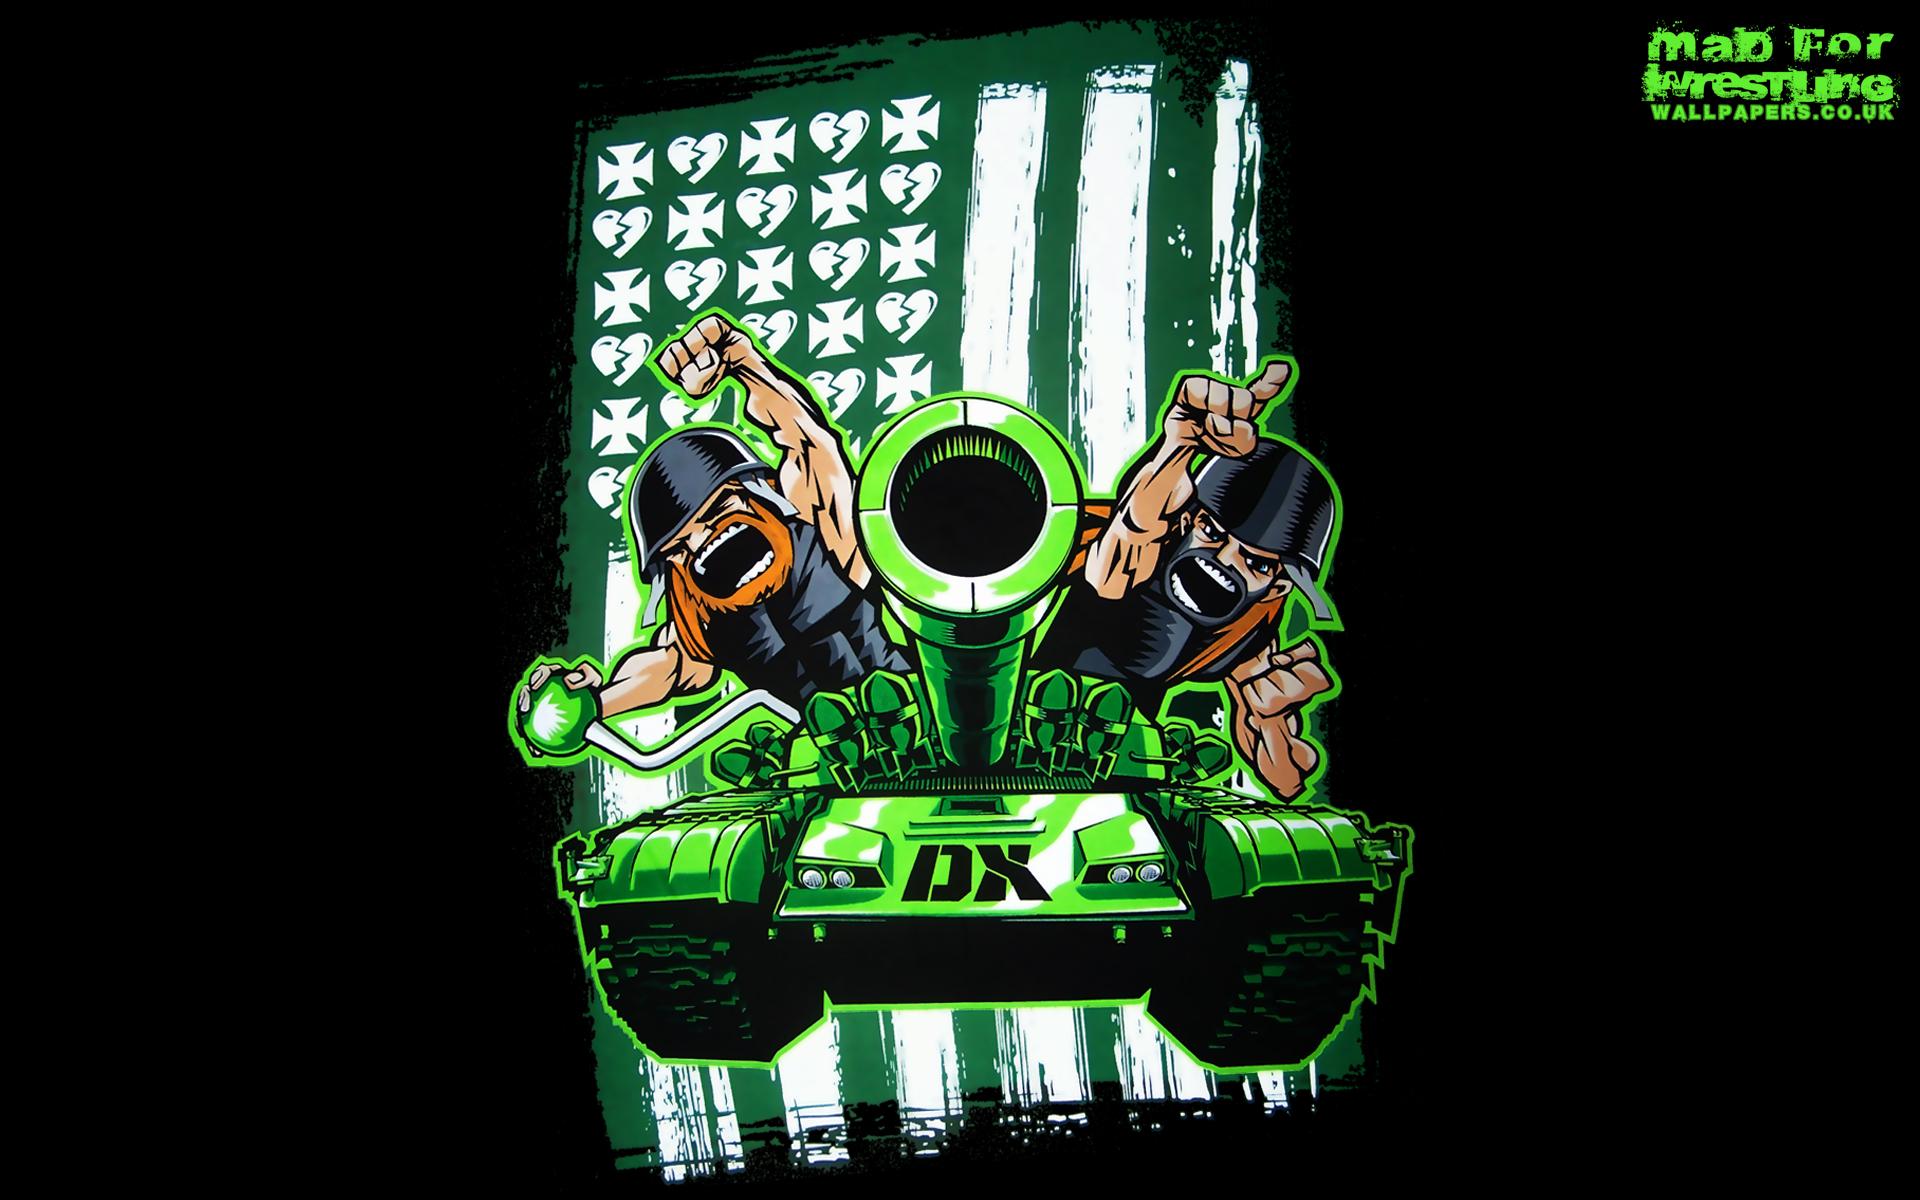 dx logo wallpaper windows phone - photo #24